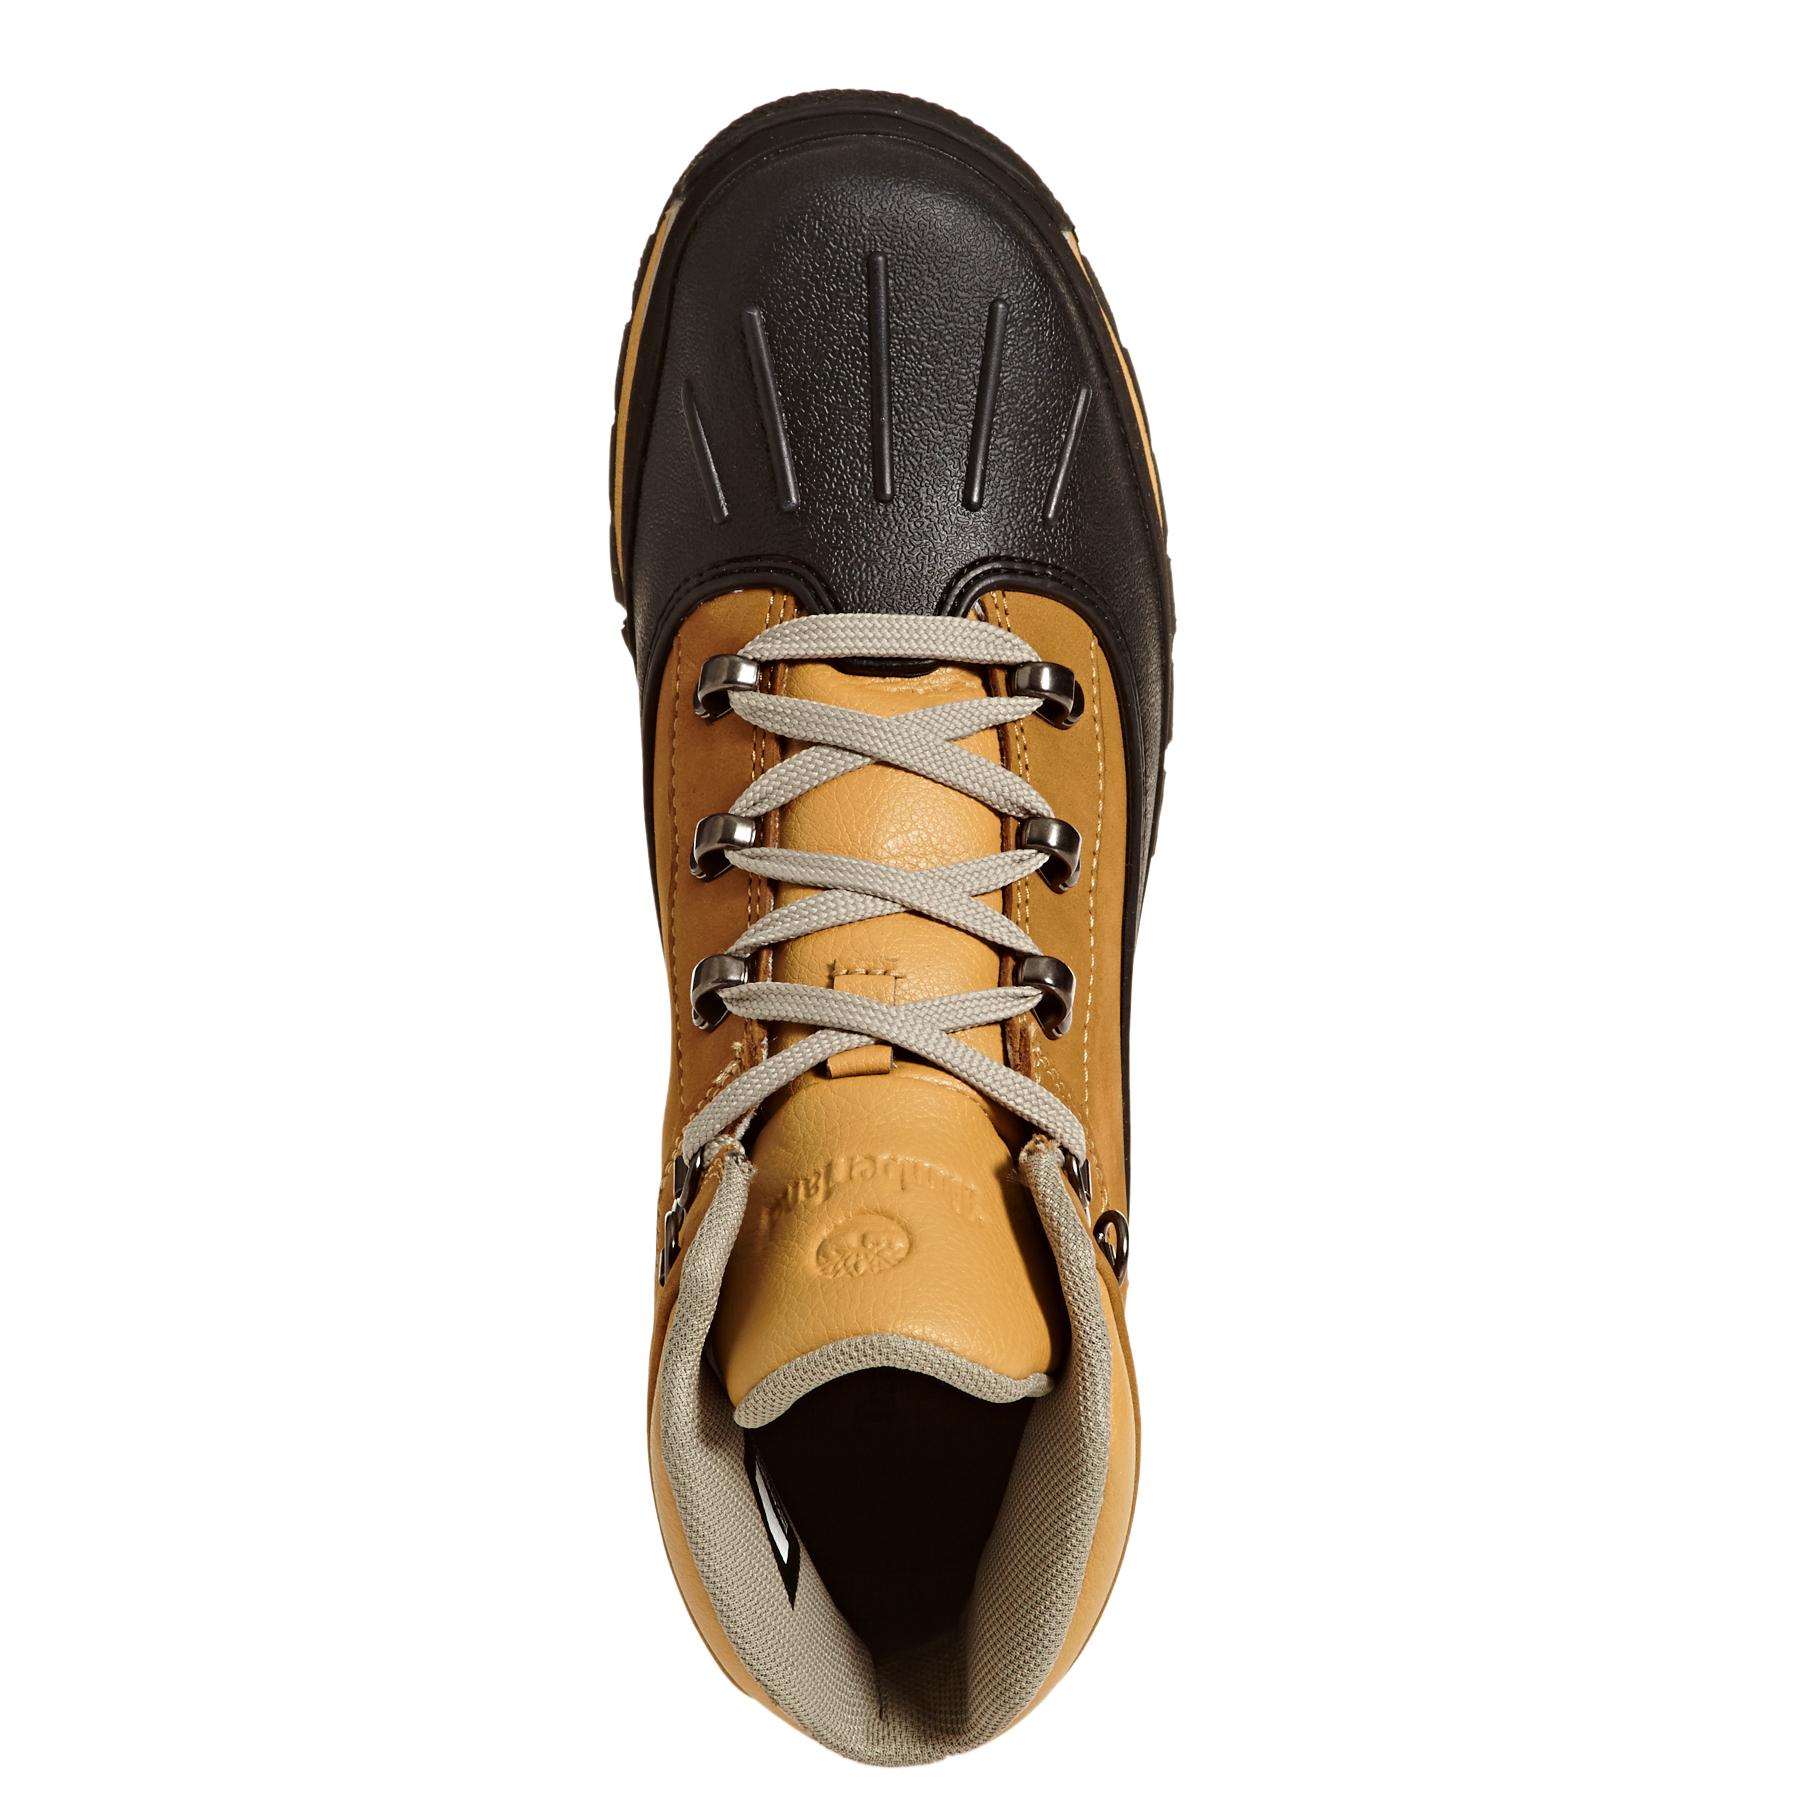 Junior Shell Toe Euro Hiker Boots